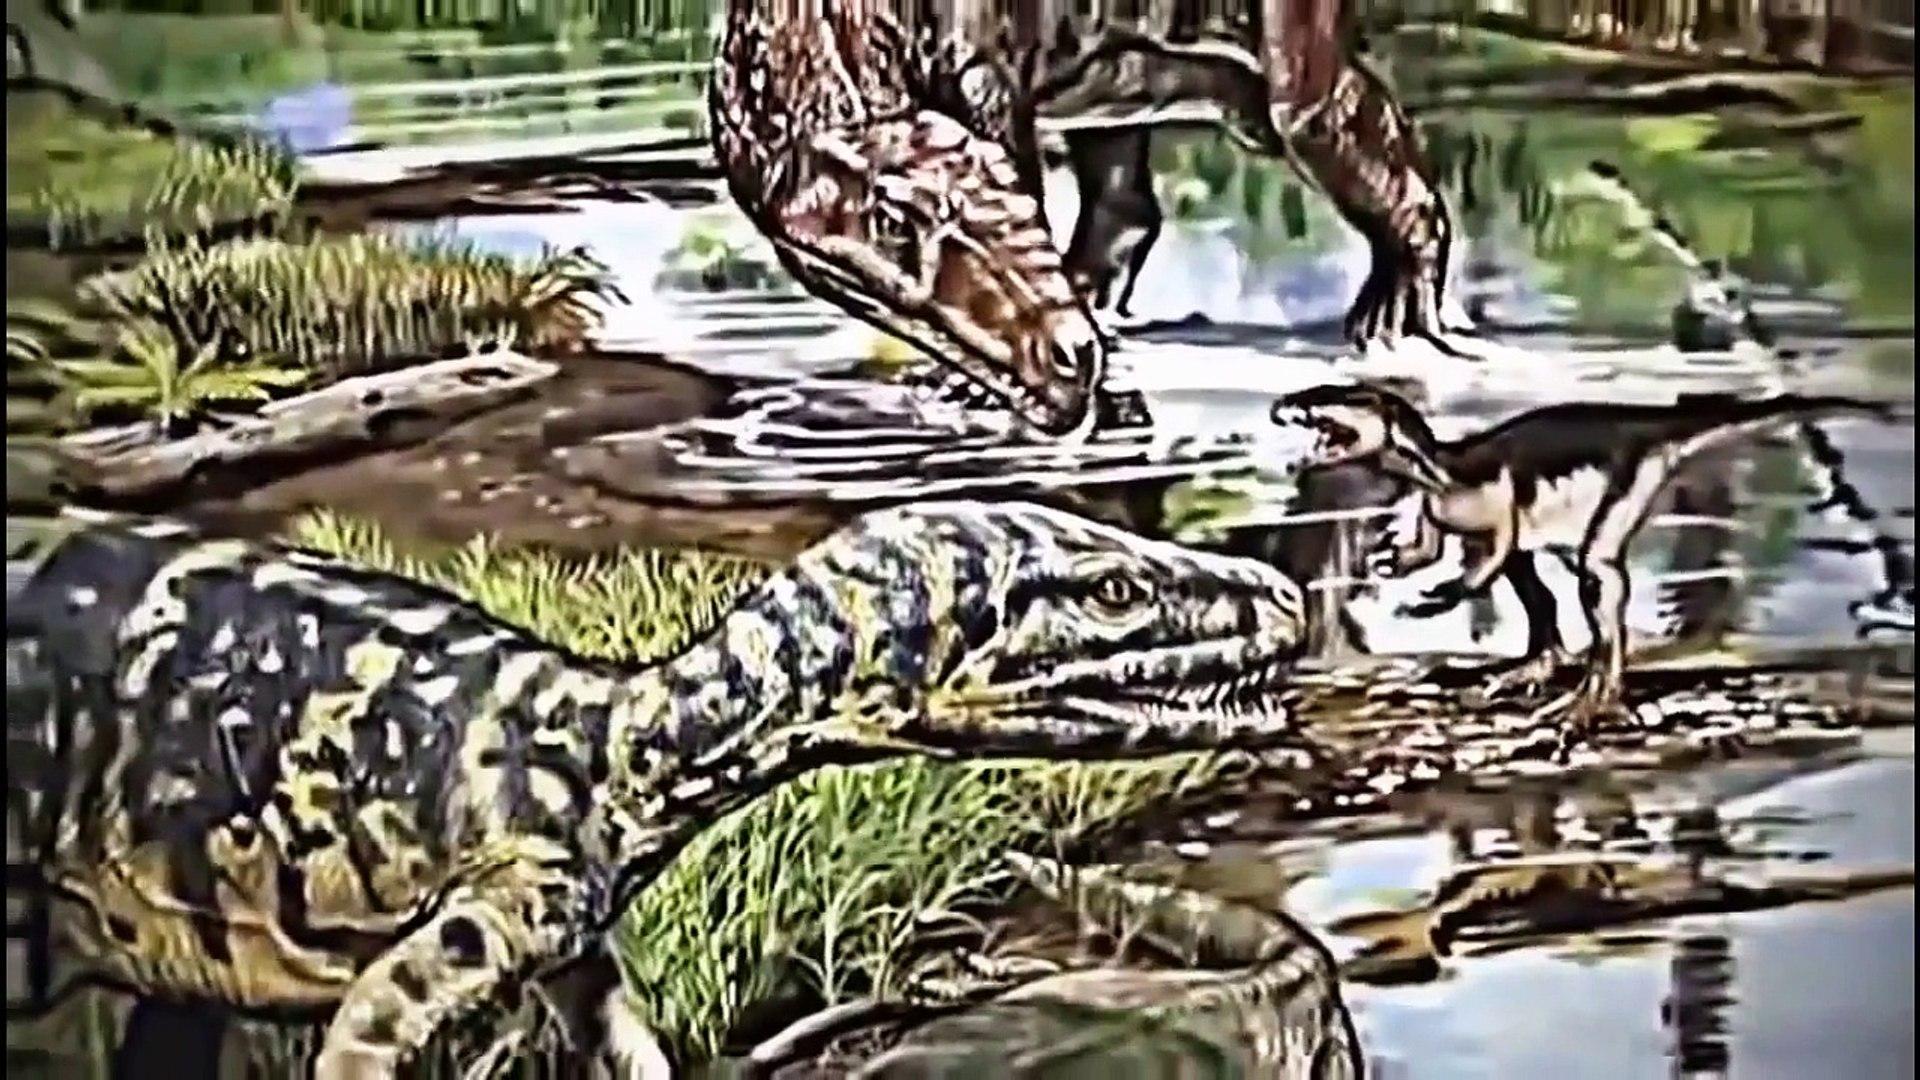 National Geographic Documentary 2015 History of Dinosaurs Full Documentaries 720p